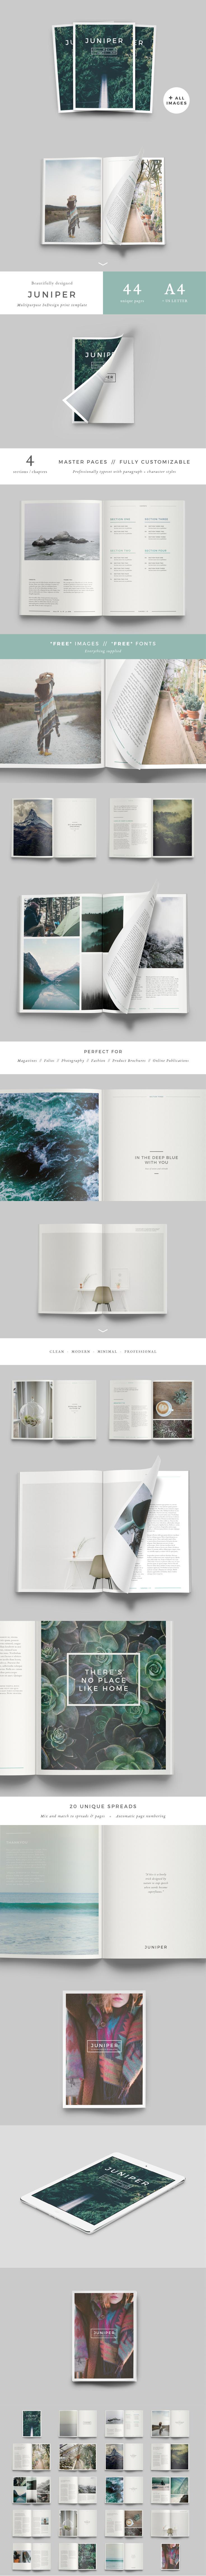 #magazine #design from 46&2 Collective   DOWNLOAD: https://creativemarket.com/Forty6and2/515976-J-U-N-I-P-E-R-Magazine-Portfolio?u=zsoltczigler